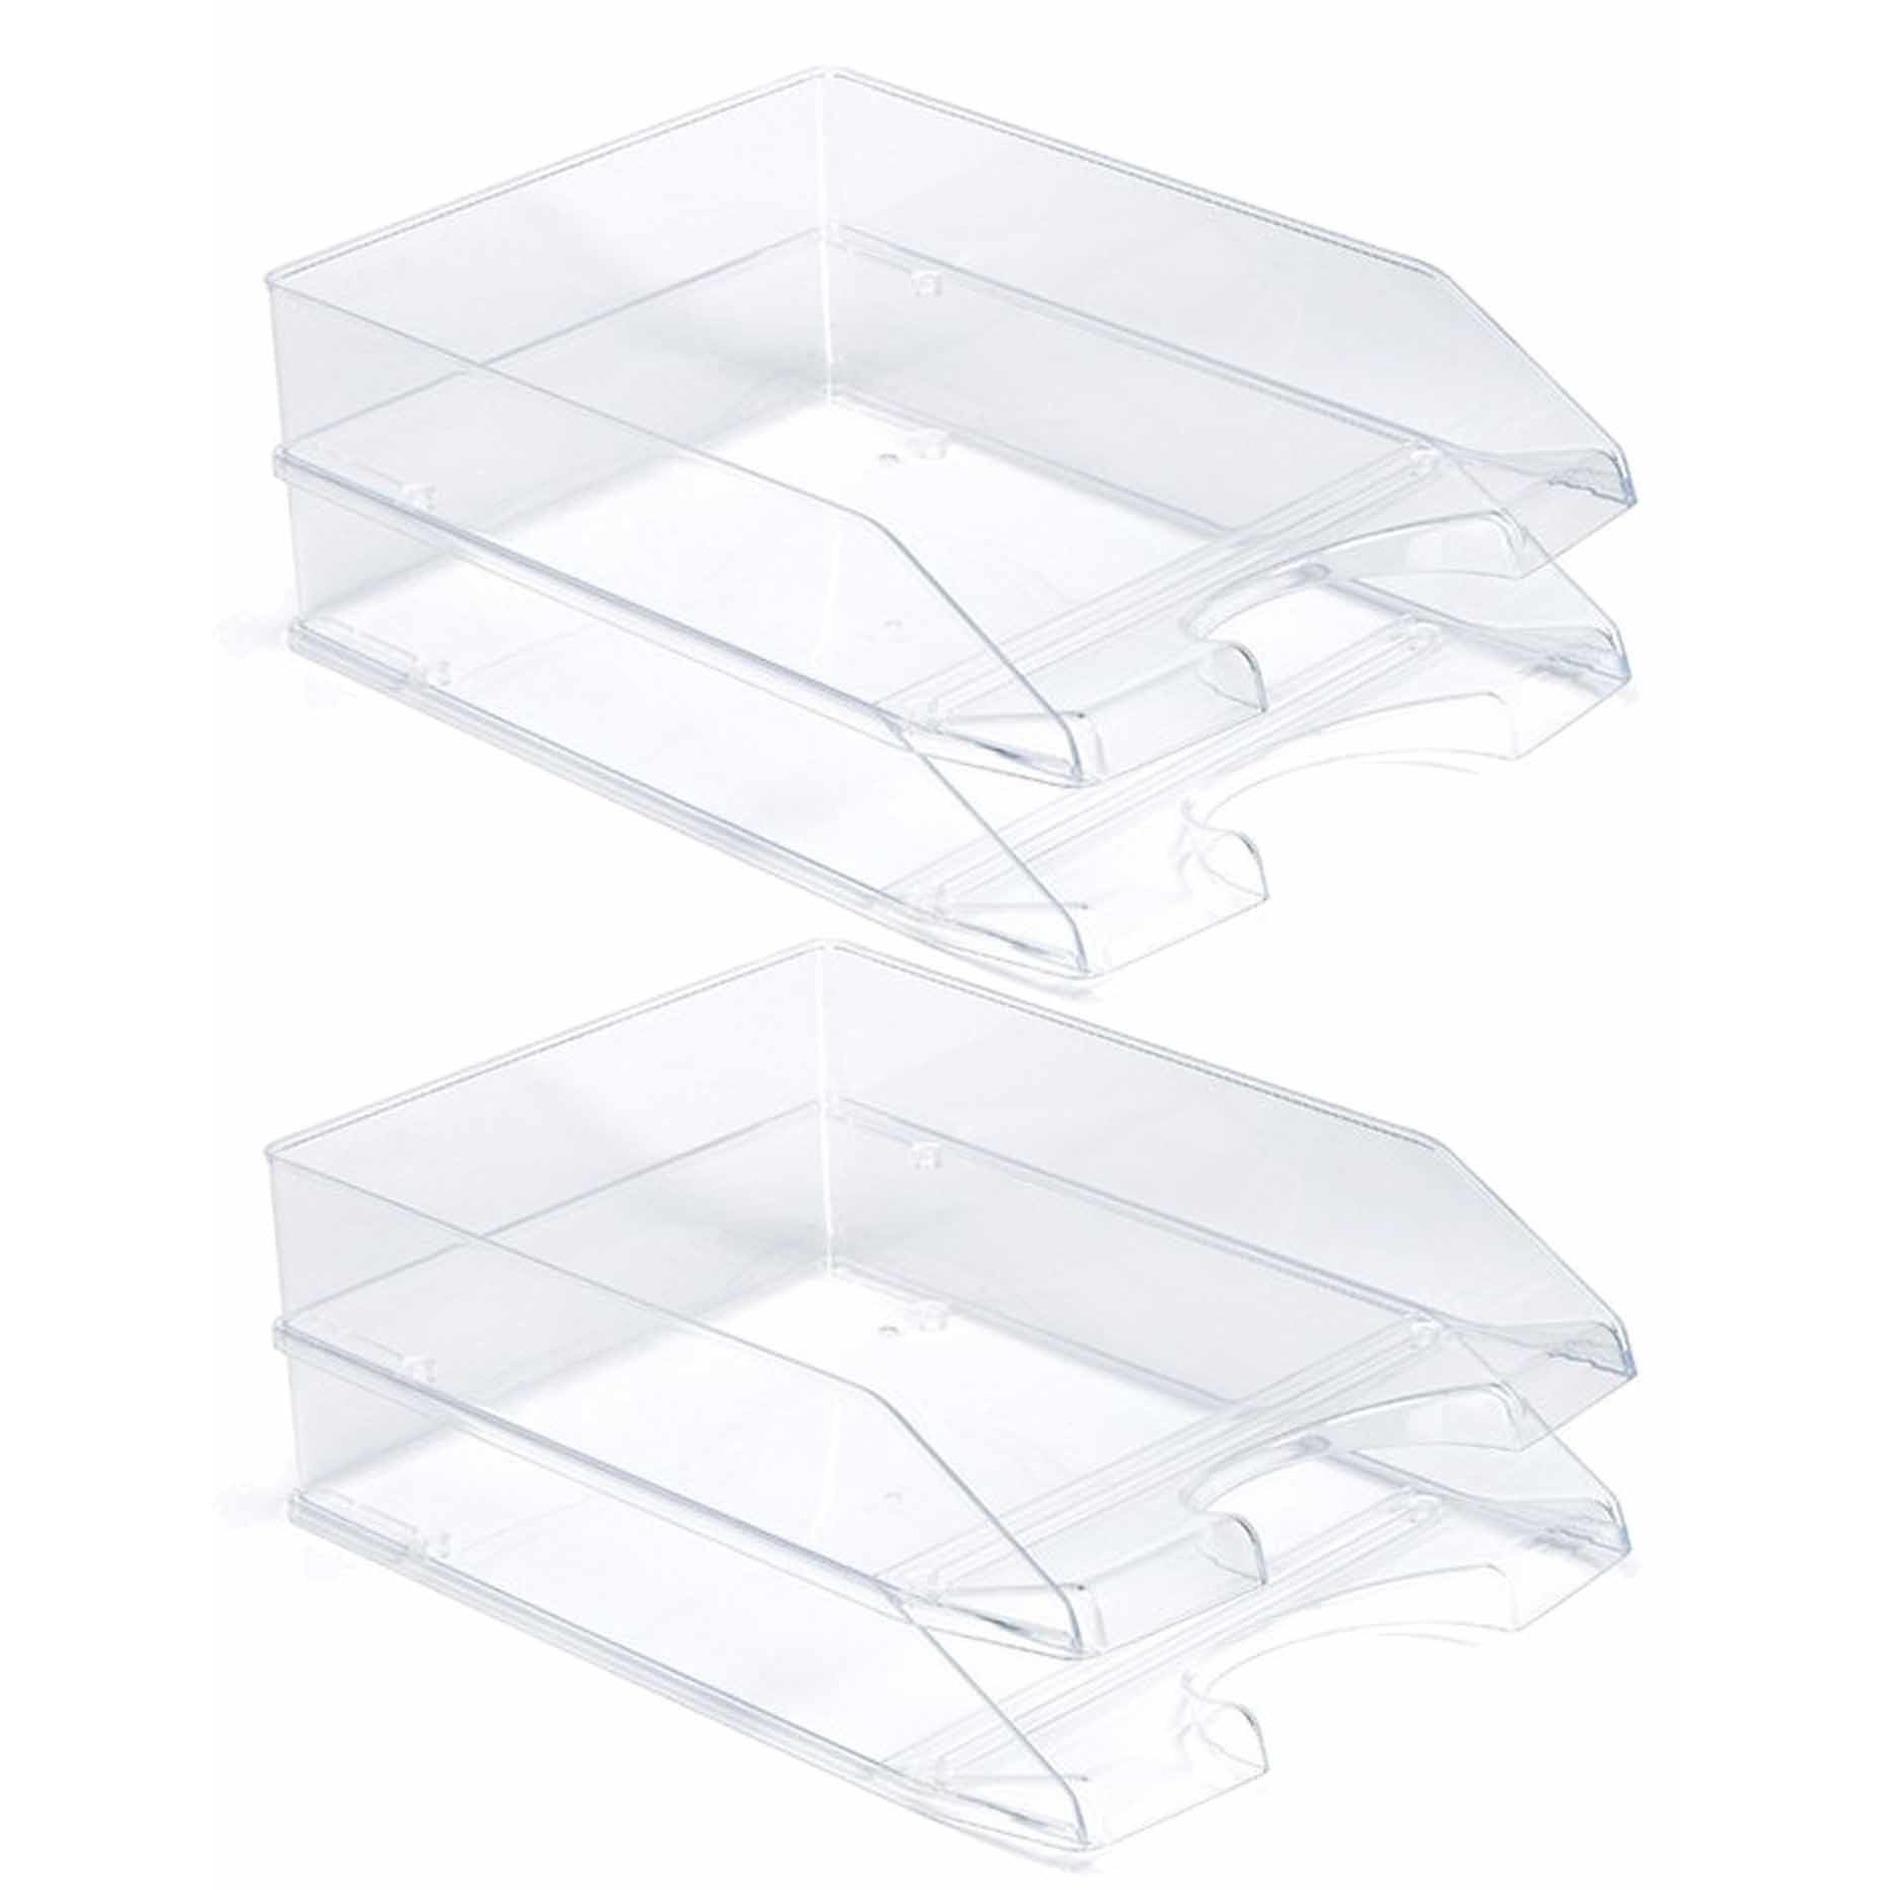 Pakket van 6x stuks postbakjejes transparant a4 formaat